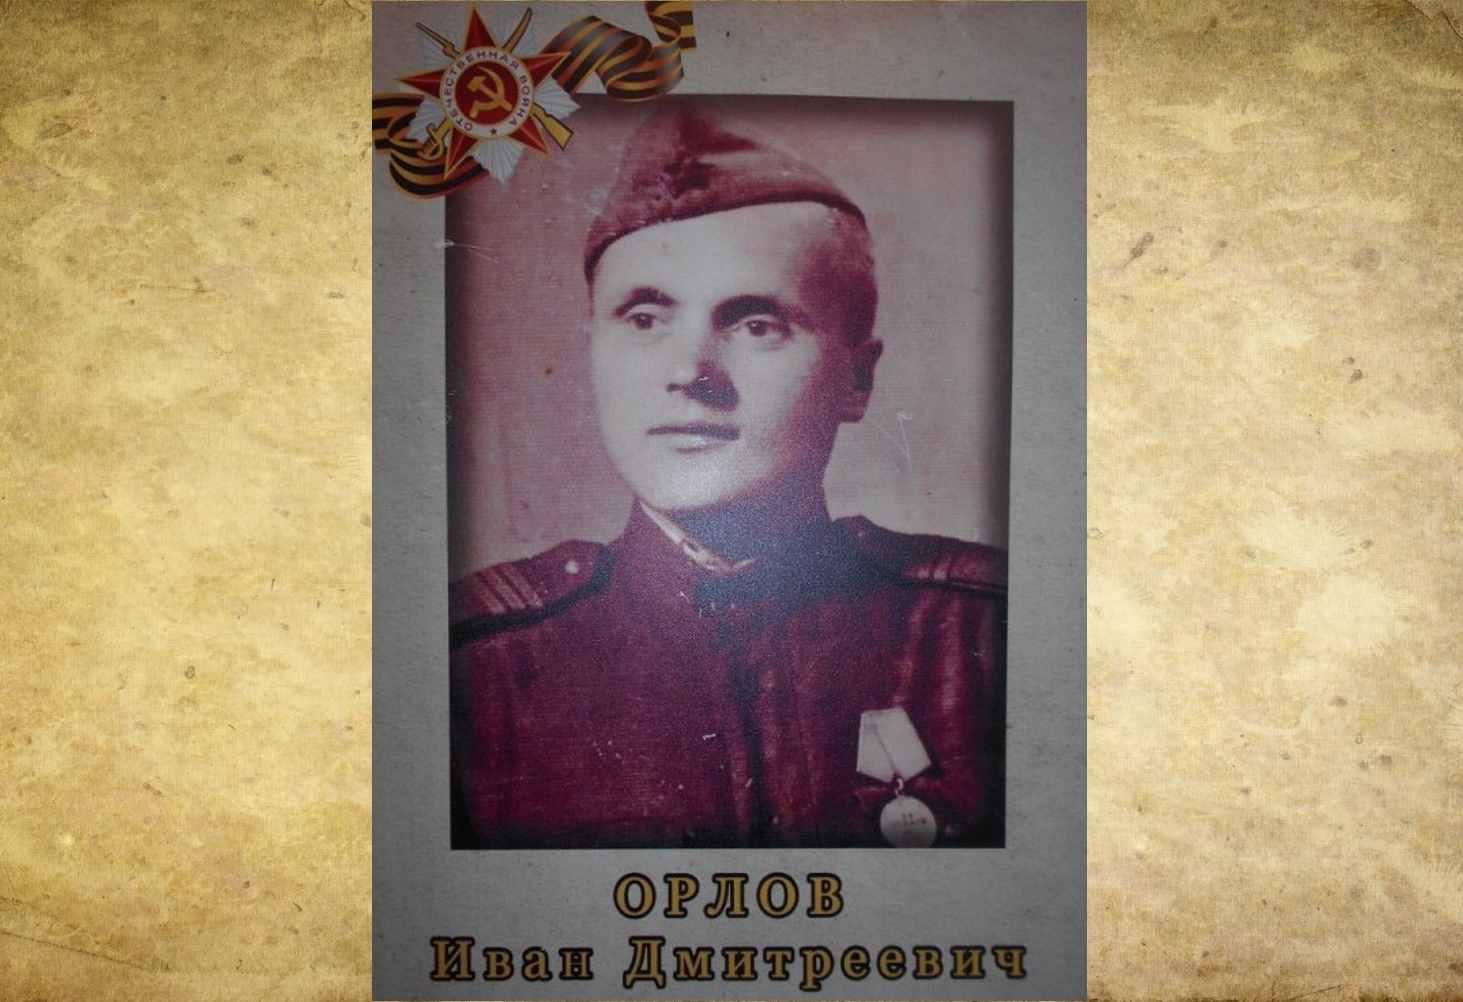 orlov-ivan-dmitrijevich